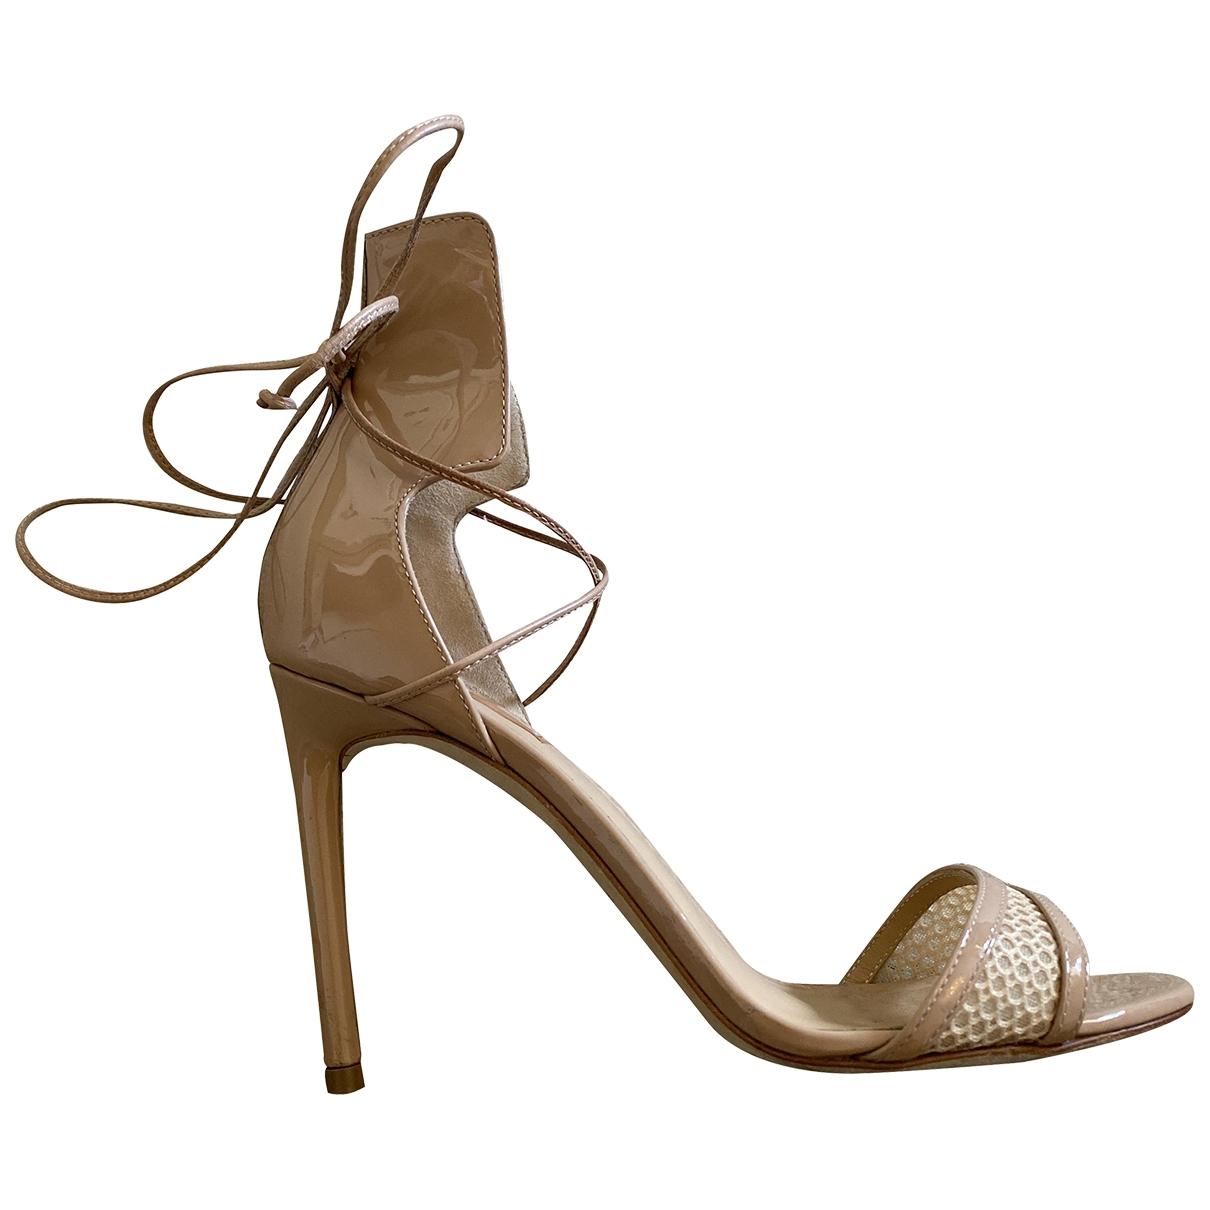 Sandalias de Charol Reed Krakoff